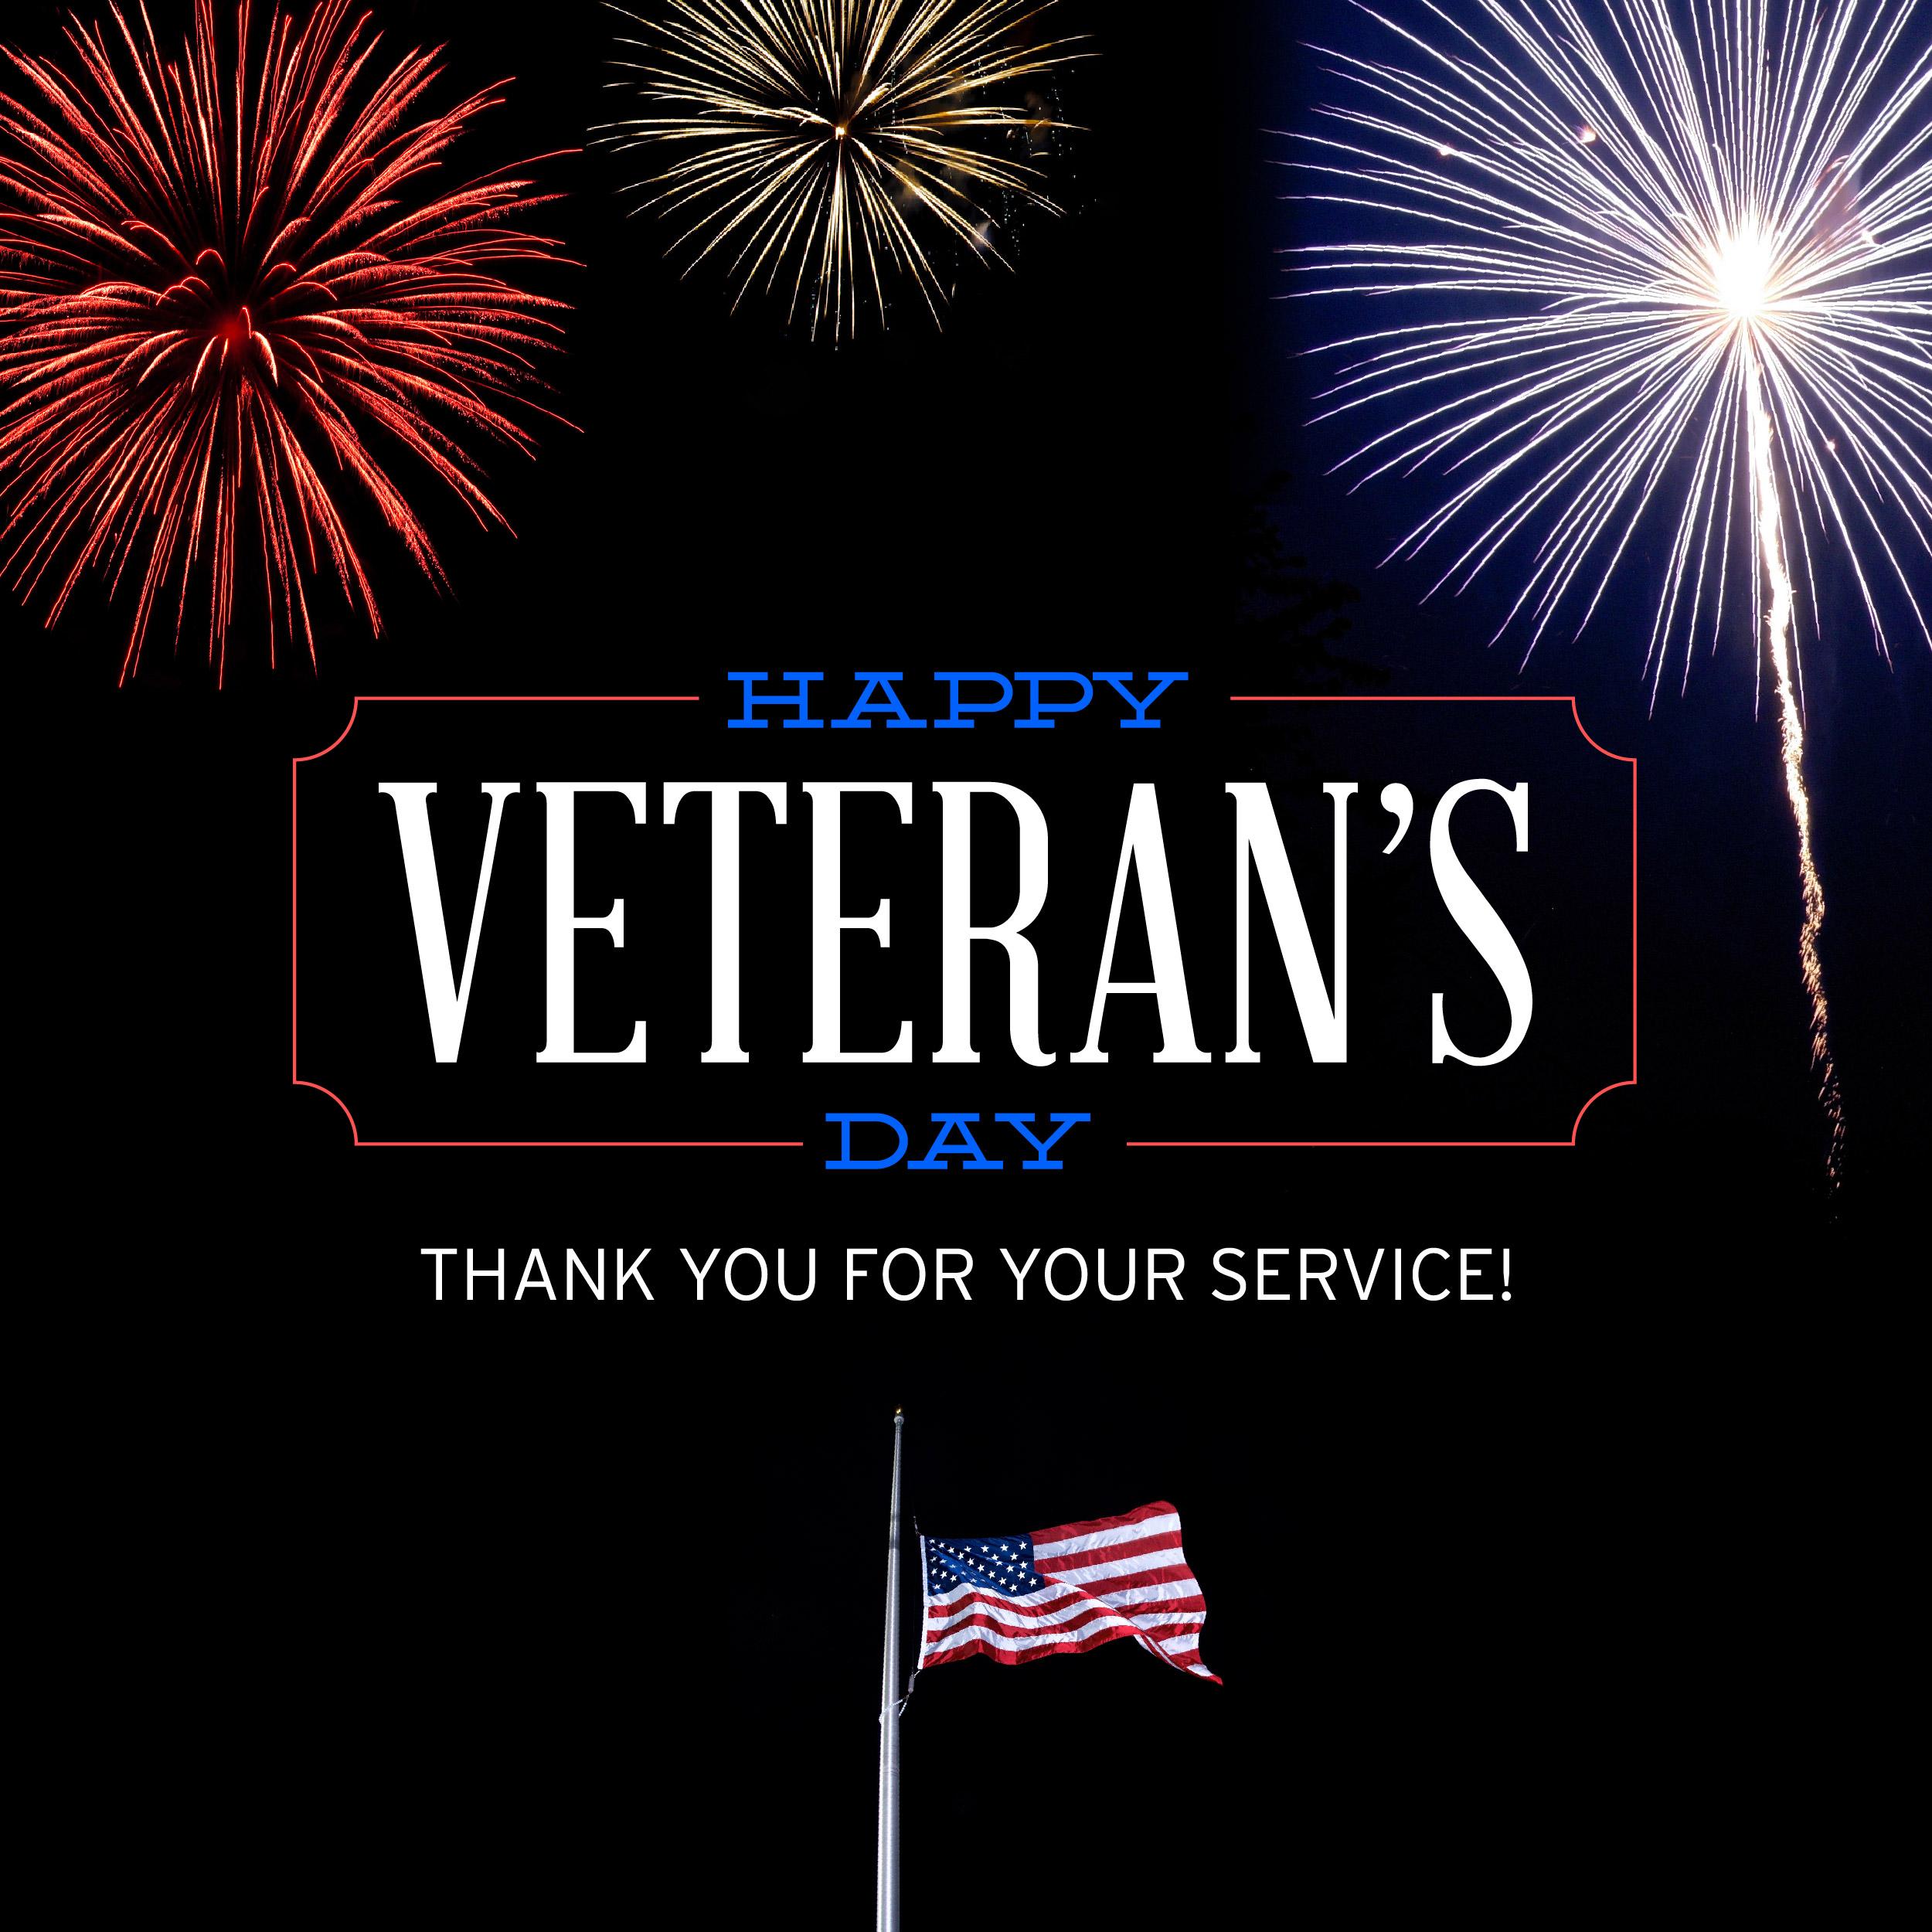 VeteransDay2016-01 (1).jpg